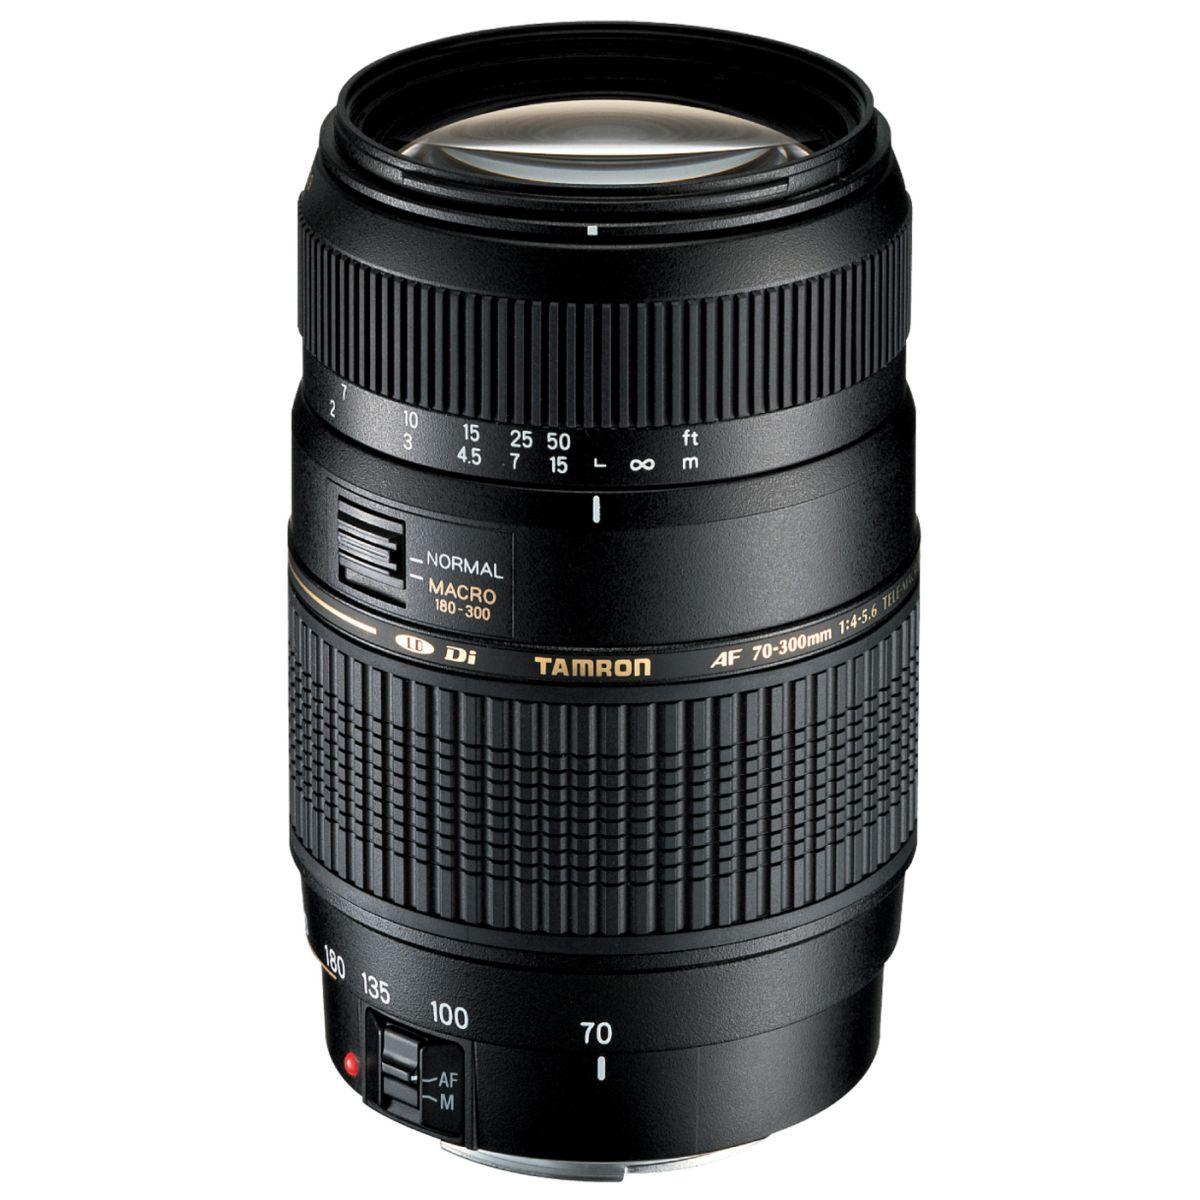 Objectif pour Reflex TAMRON AF 70-300mm f/4-5.6 Di LD IF 1:2 C...